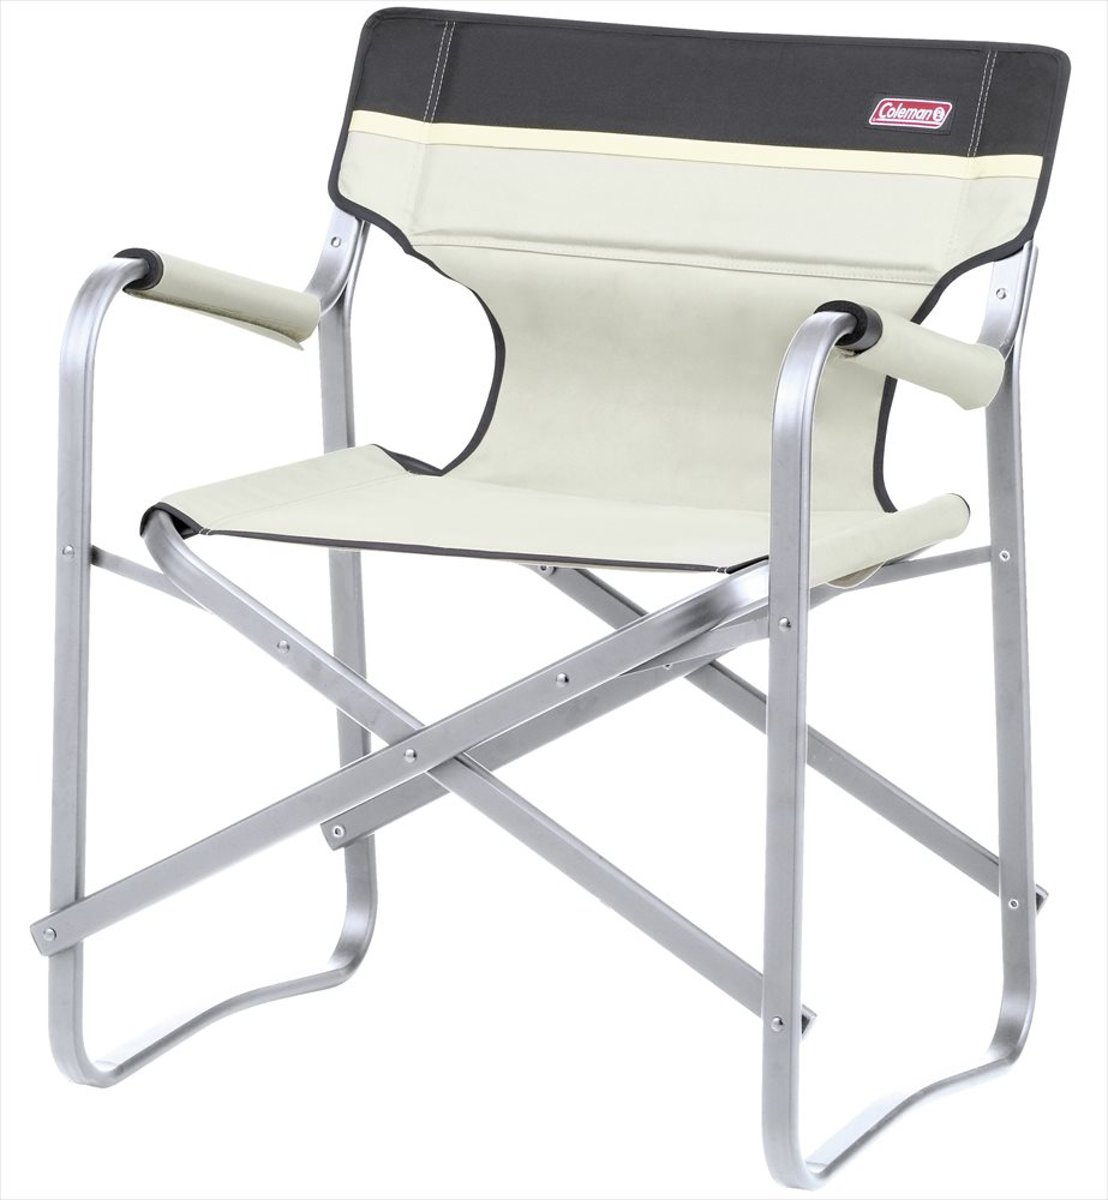 Coleman Deck Chair - Campingstoel met Tafel -  - Wit